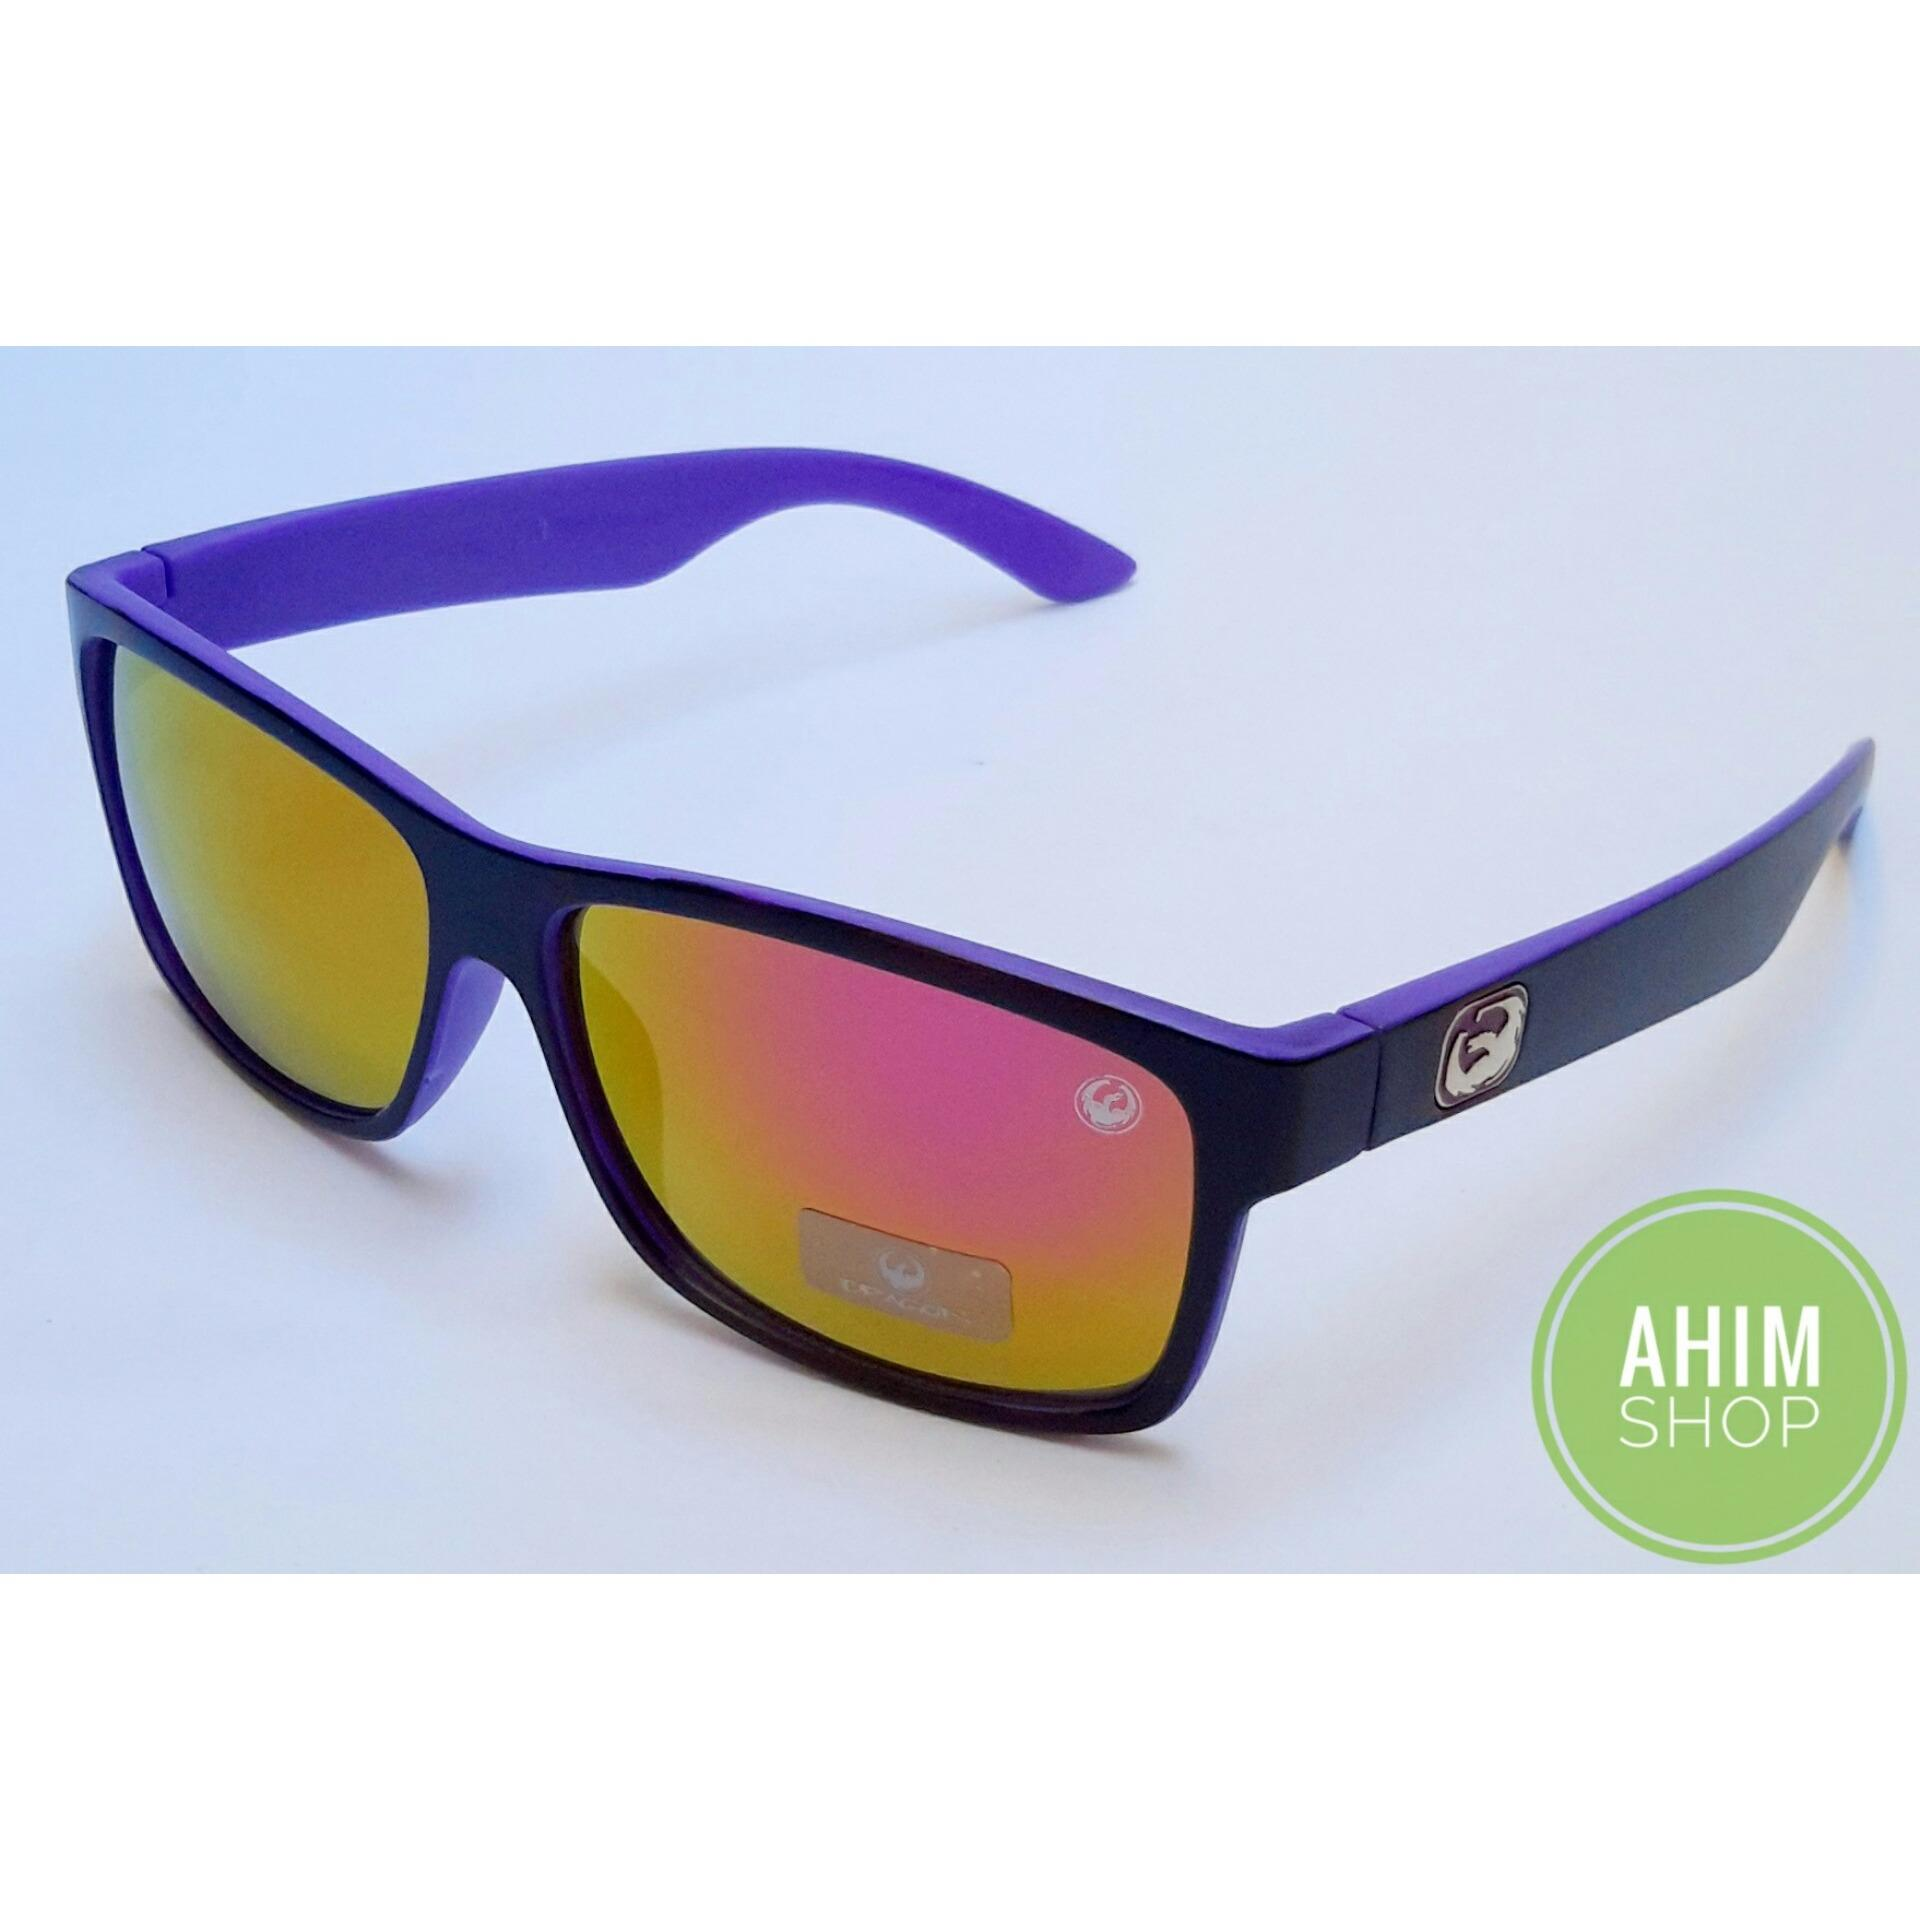 ... Ahim Shop - UV400 Kacamata Fashion Sports Stylish Pria Wanita - Sunglasses  Dragon AL214-2 ... 48c47ea072